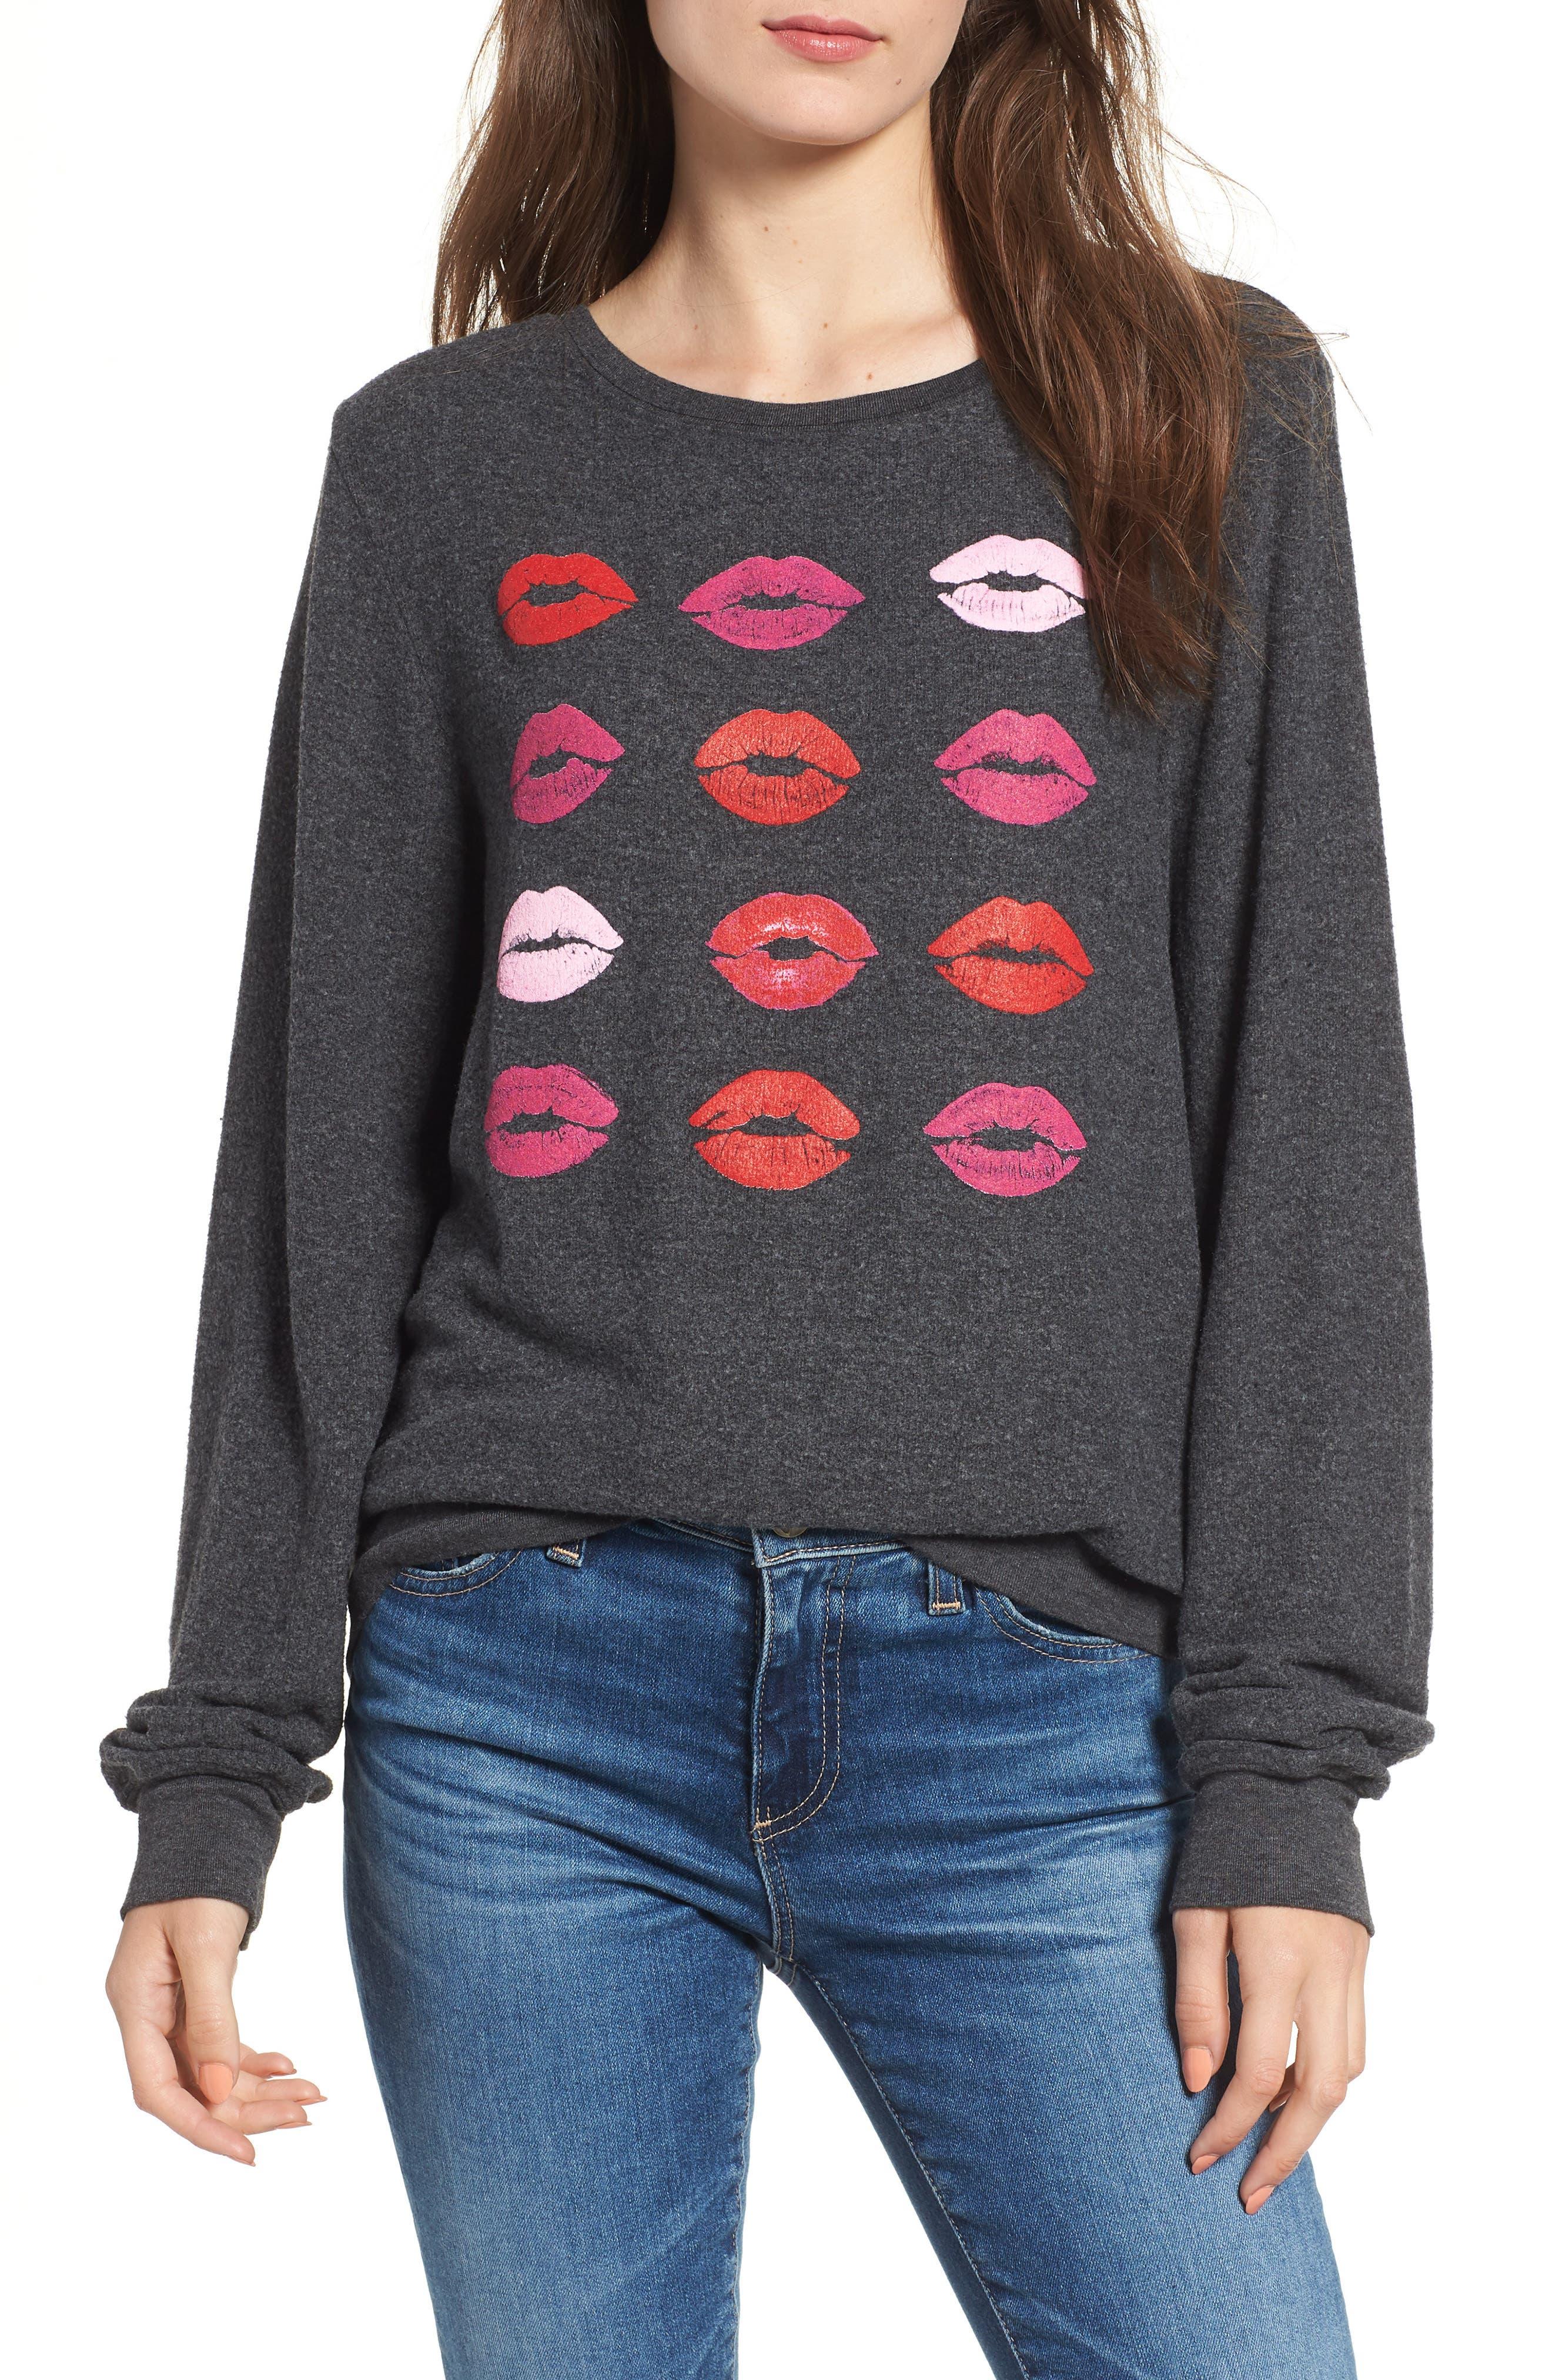 Smooches Baggy Beach Jumper Sweatshirt,                             Main thumbnail 1, color,                             002